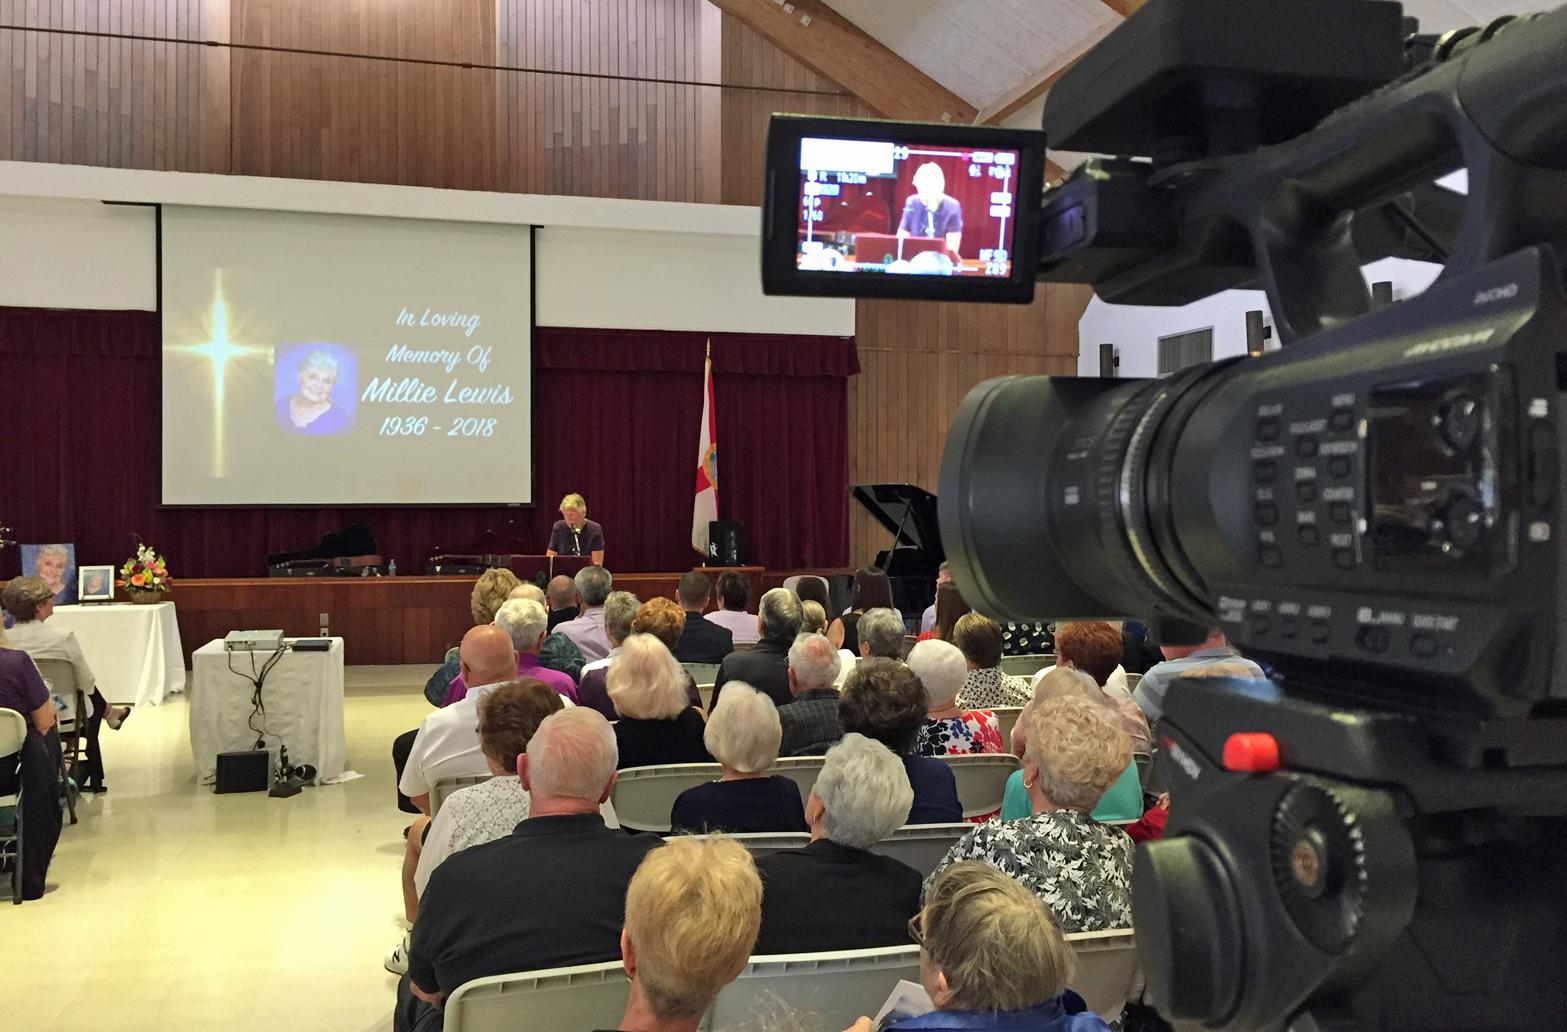 Videotaping Memorial Services